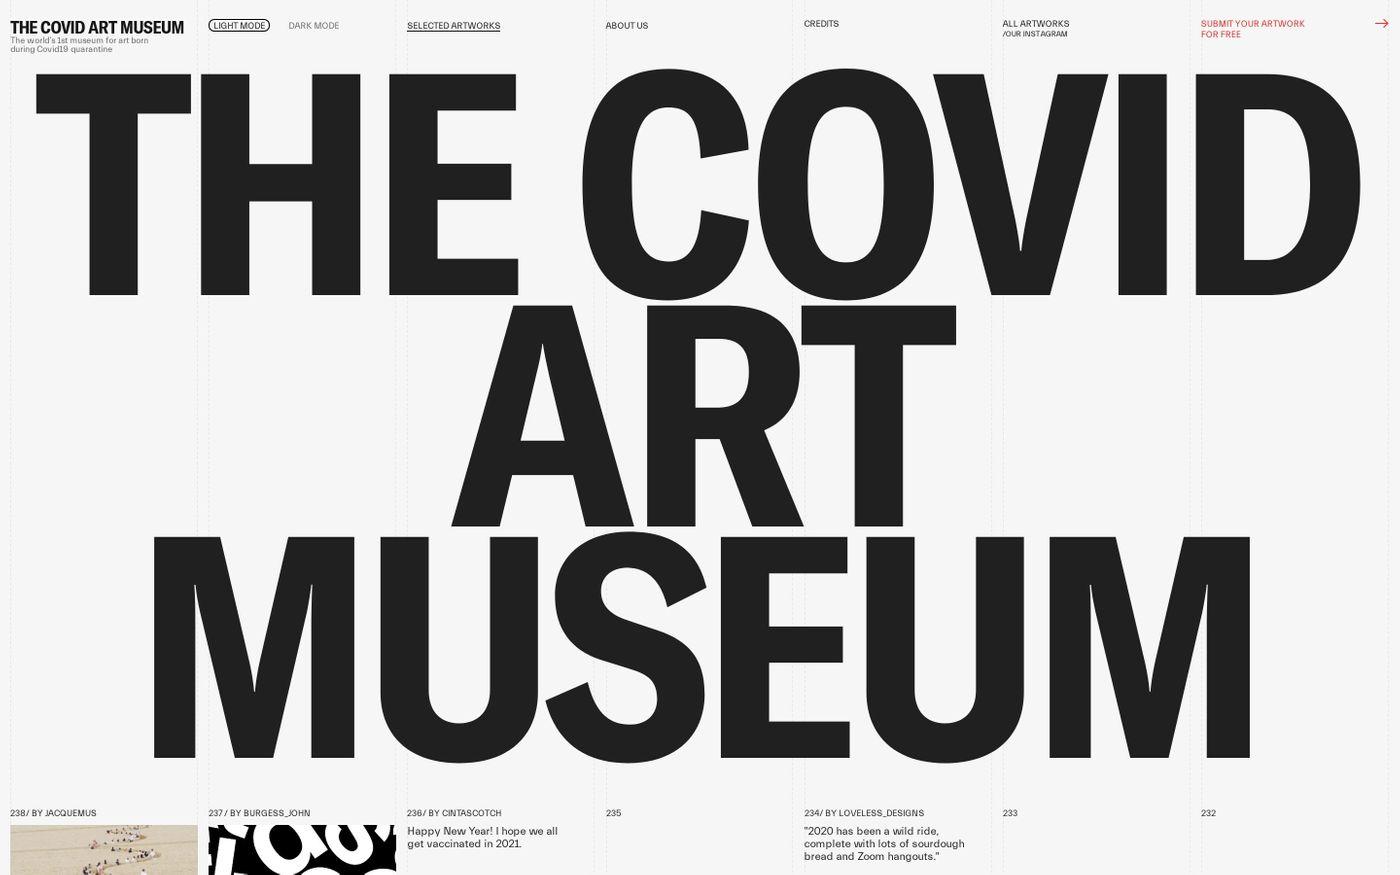 Screenshot of The Covid art museum website